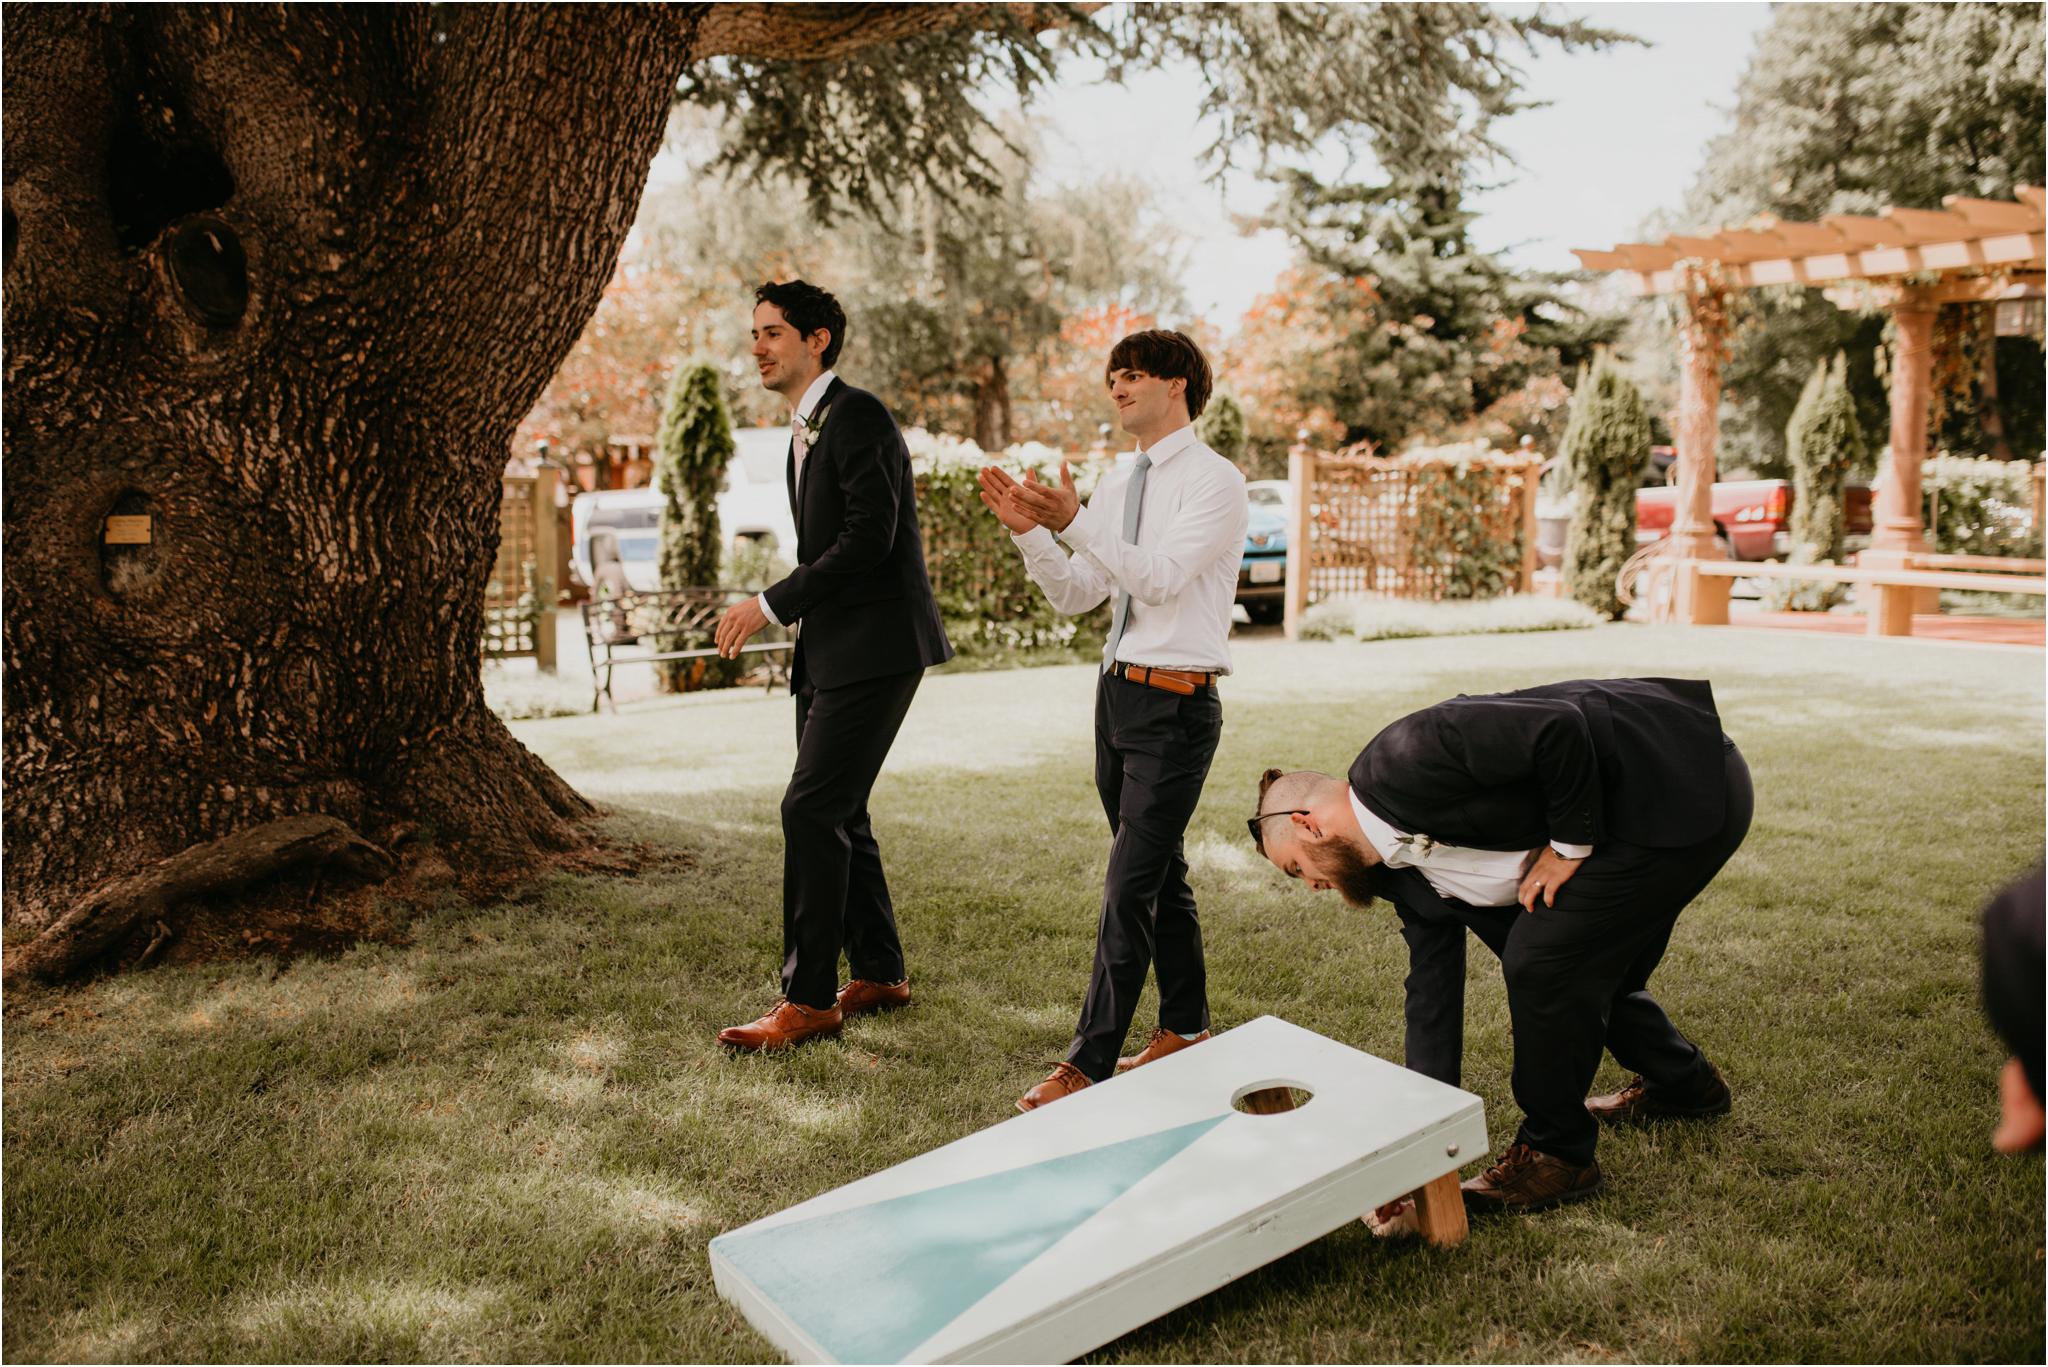 chance-and-ondrea-lairmont-manor-wedding-seattle-photographer-024.jpg